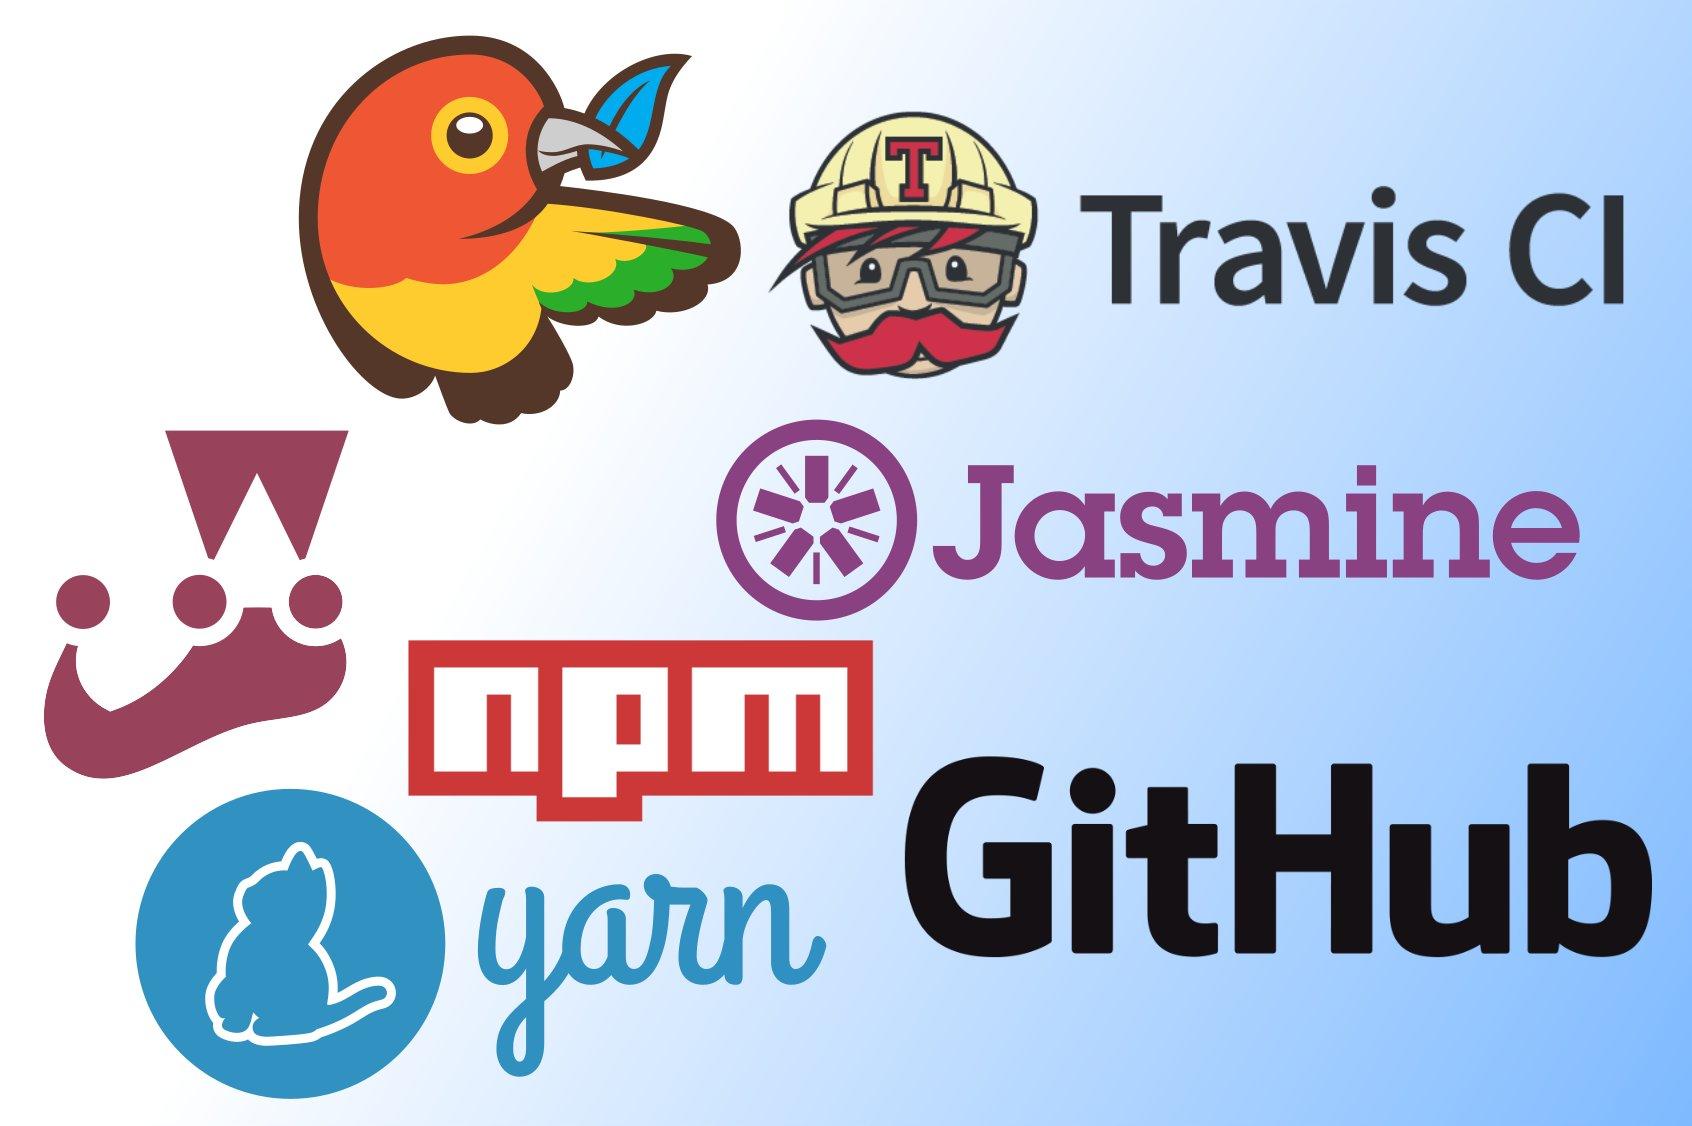 Logos for JavaScript tools